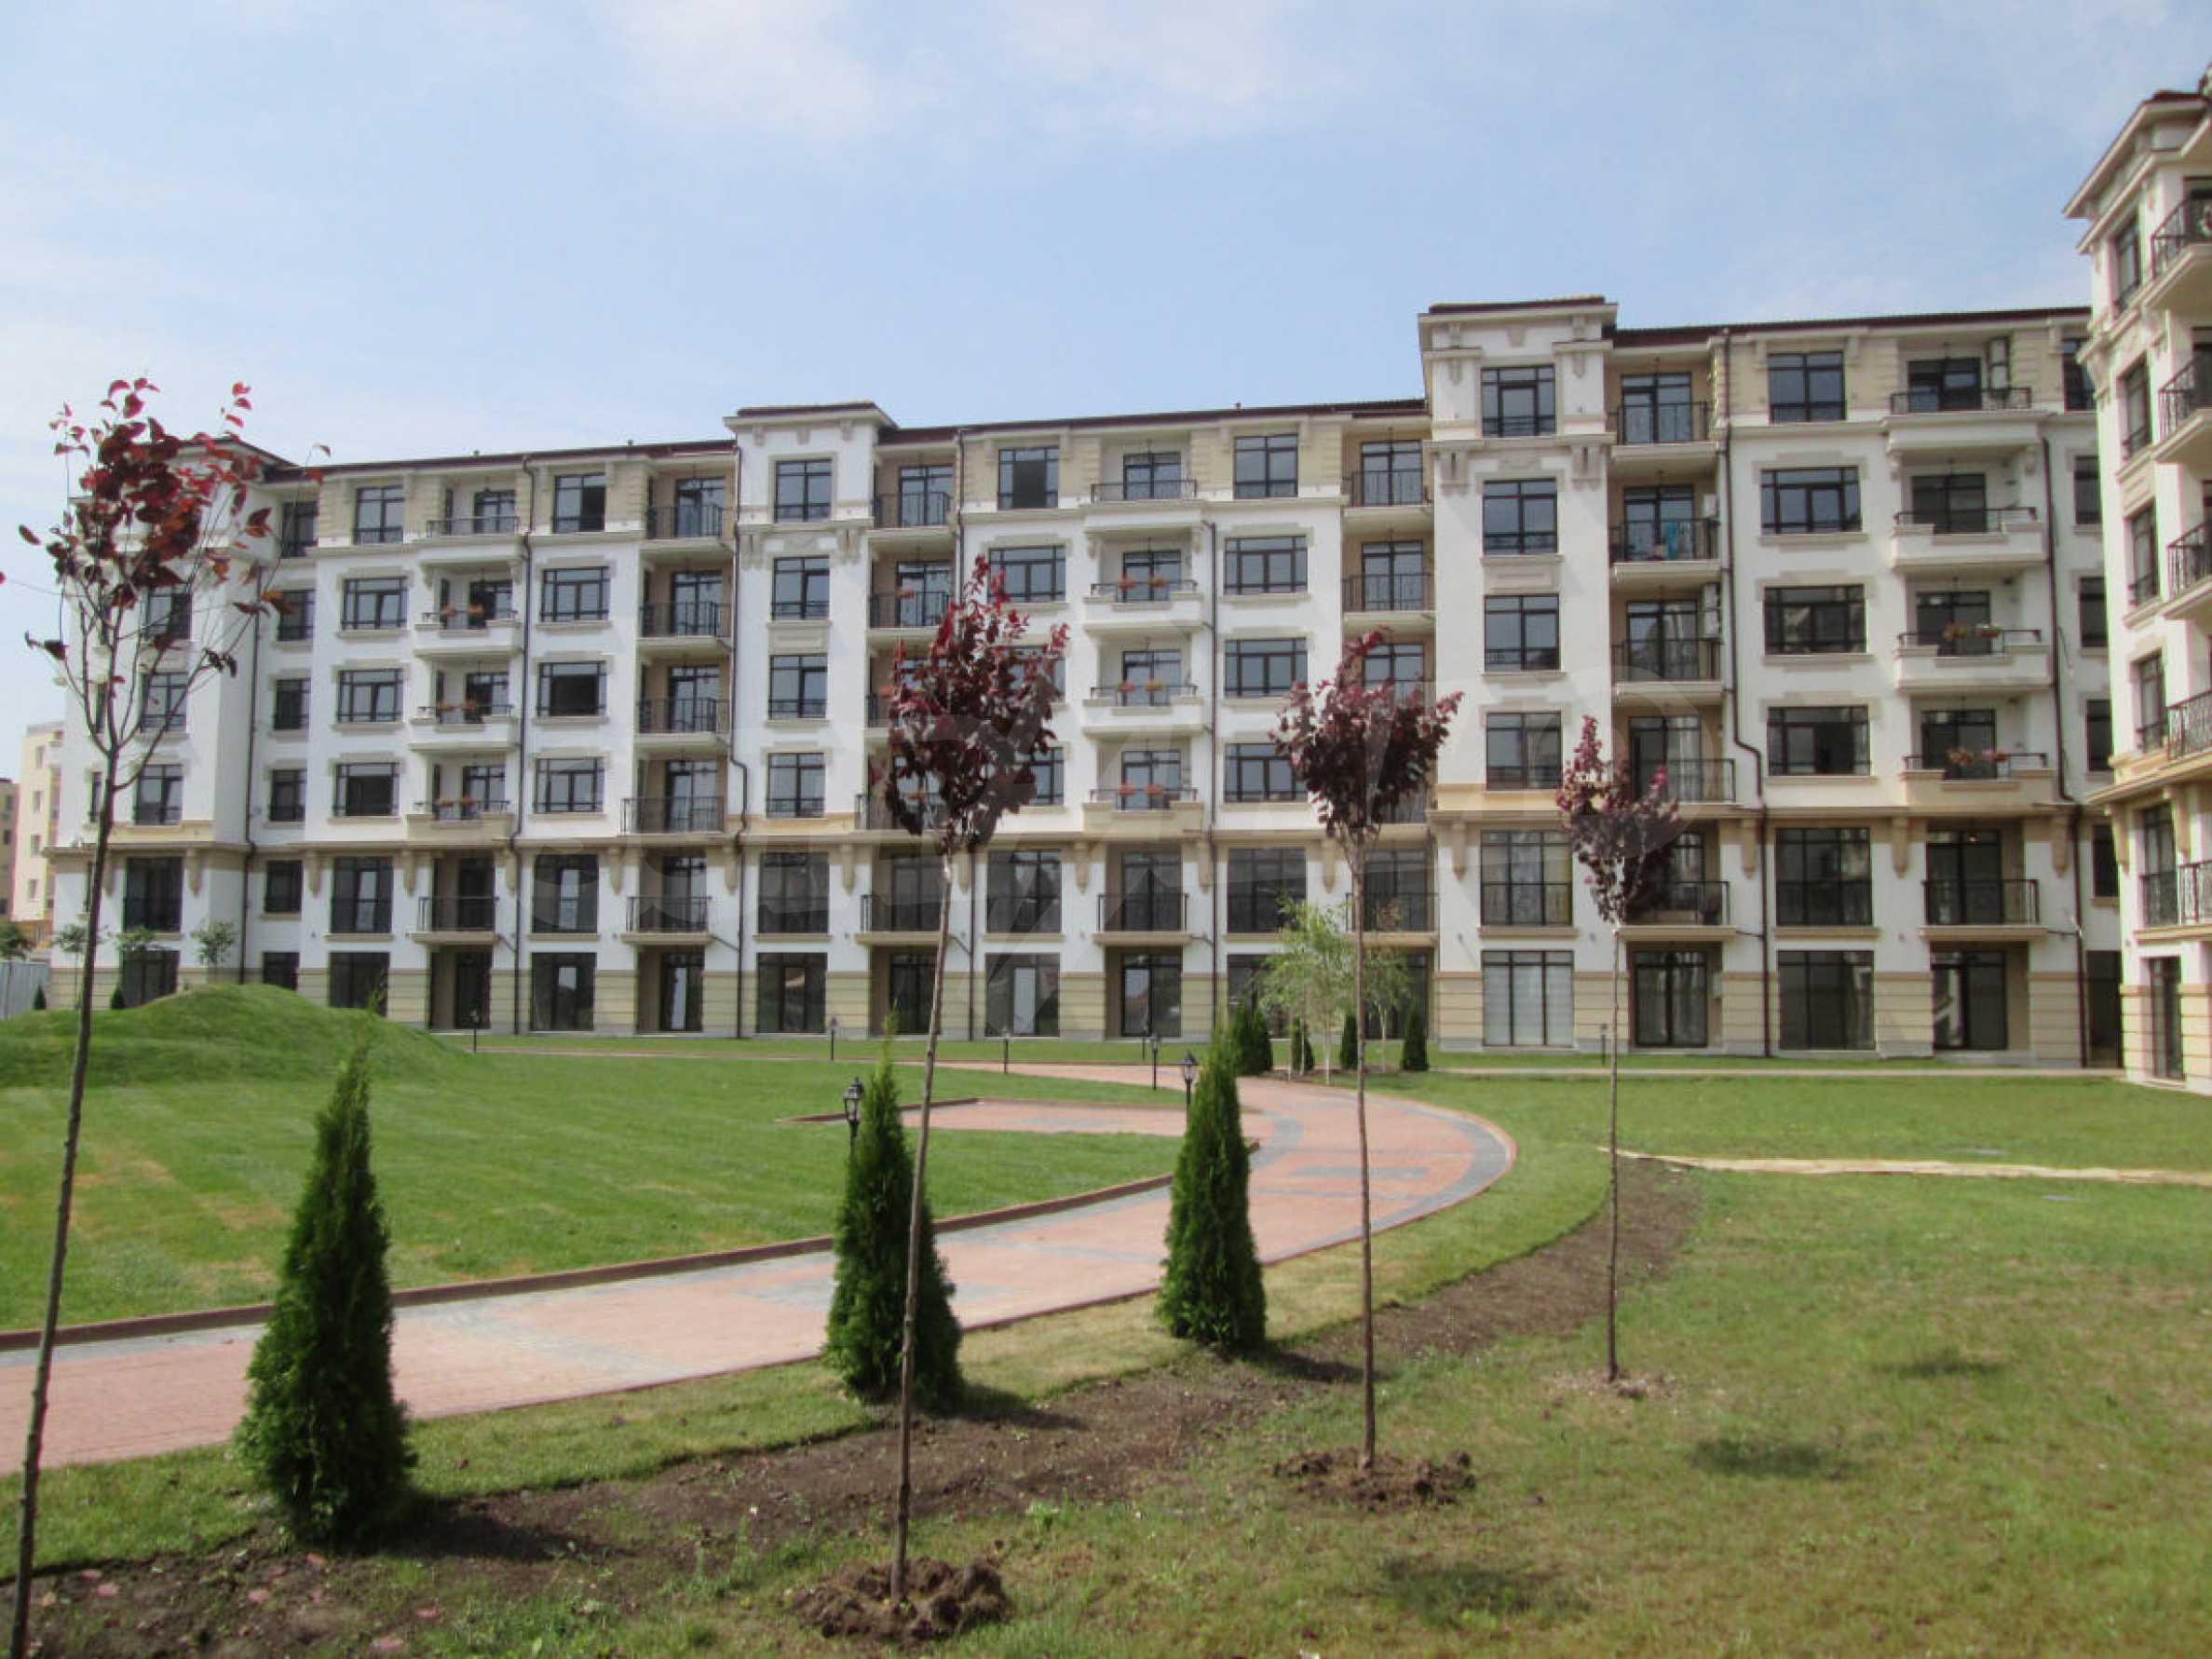 Aivazovsky Park